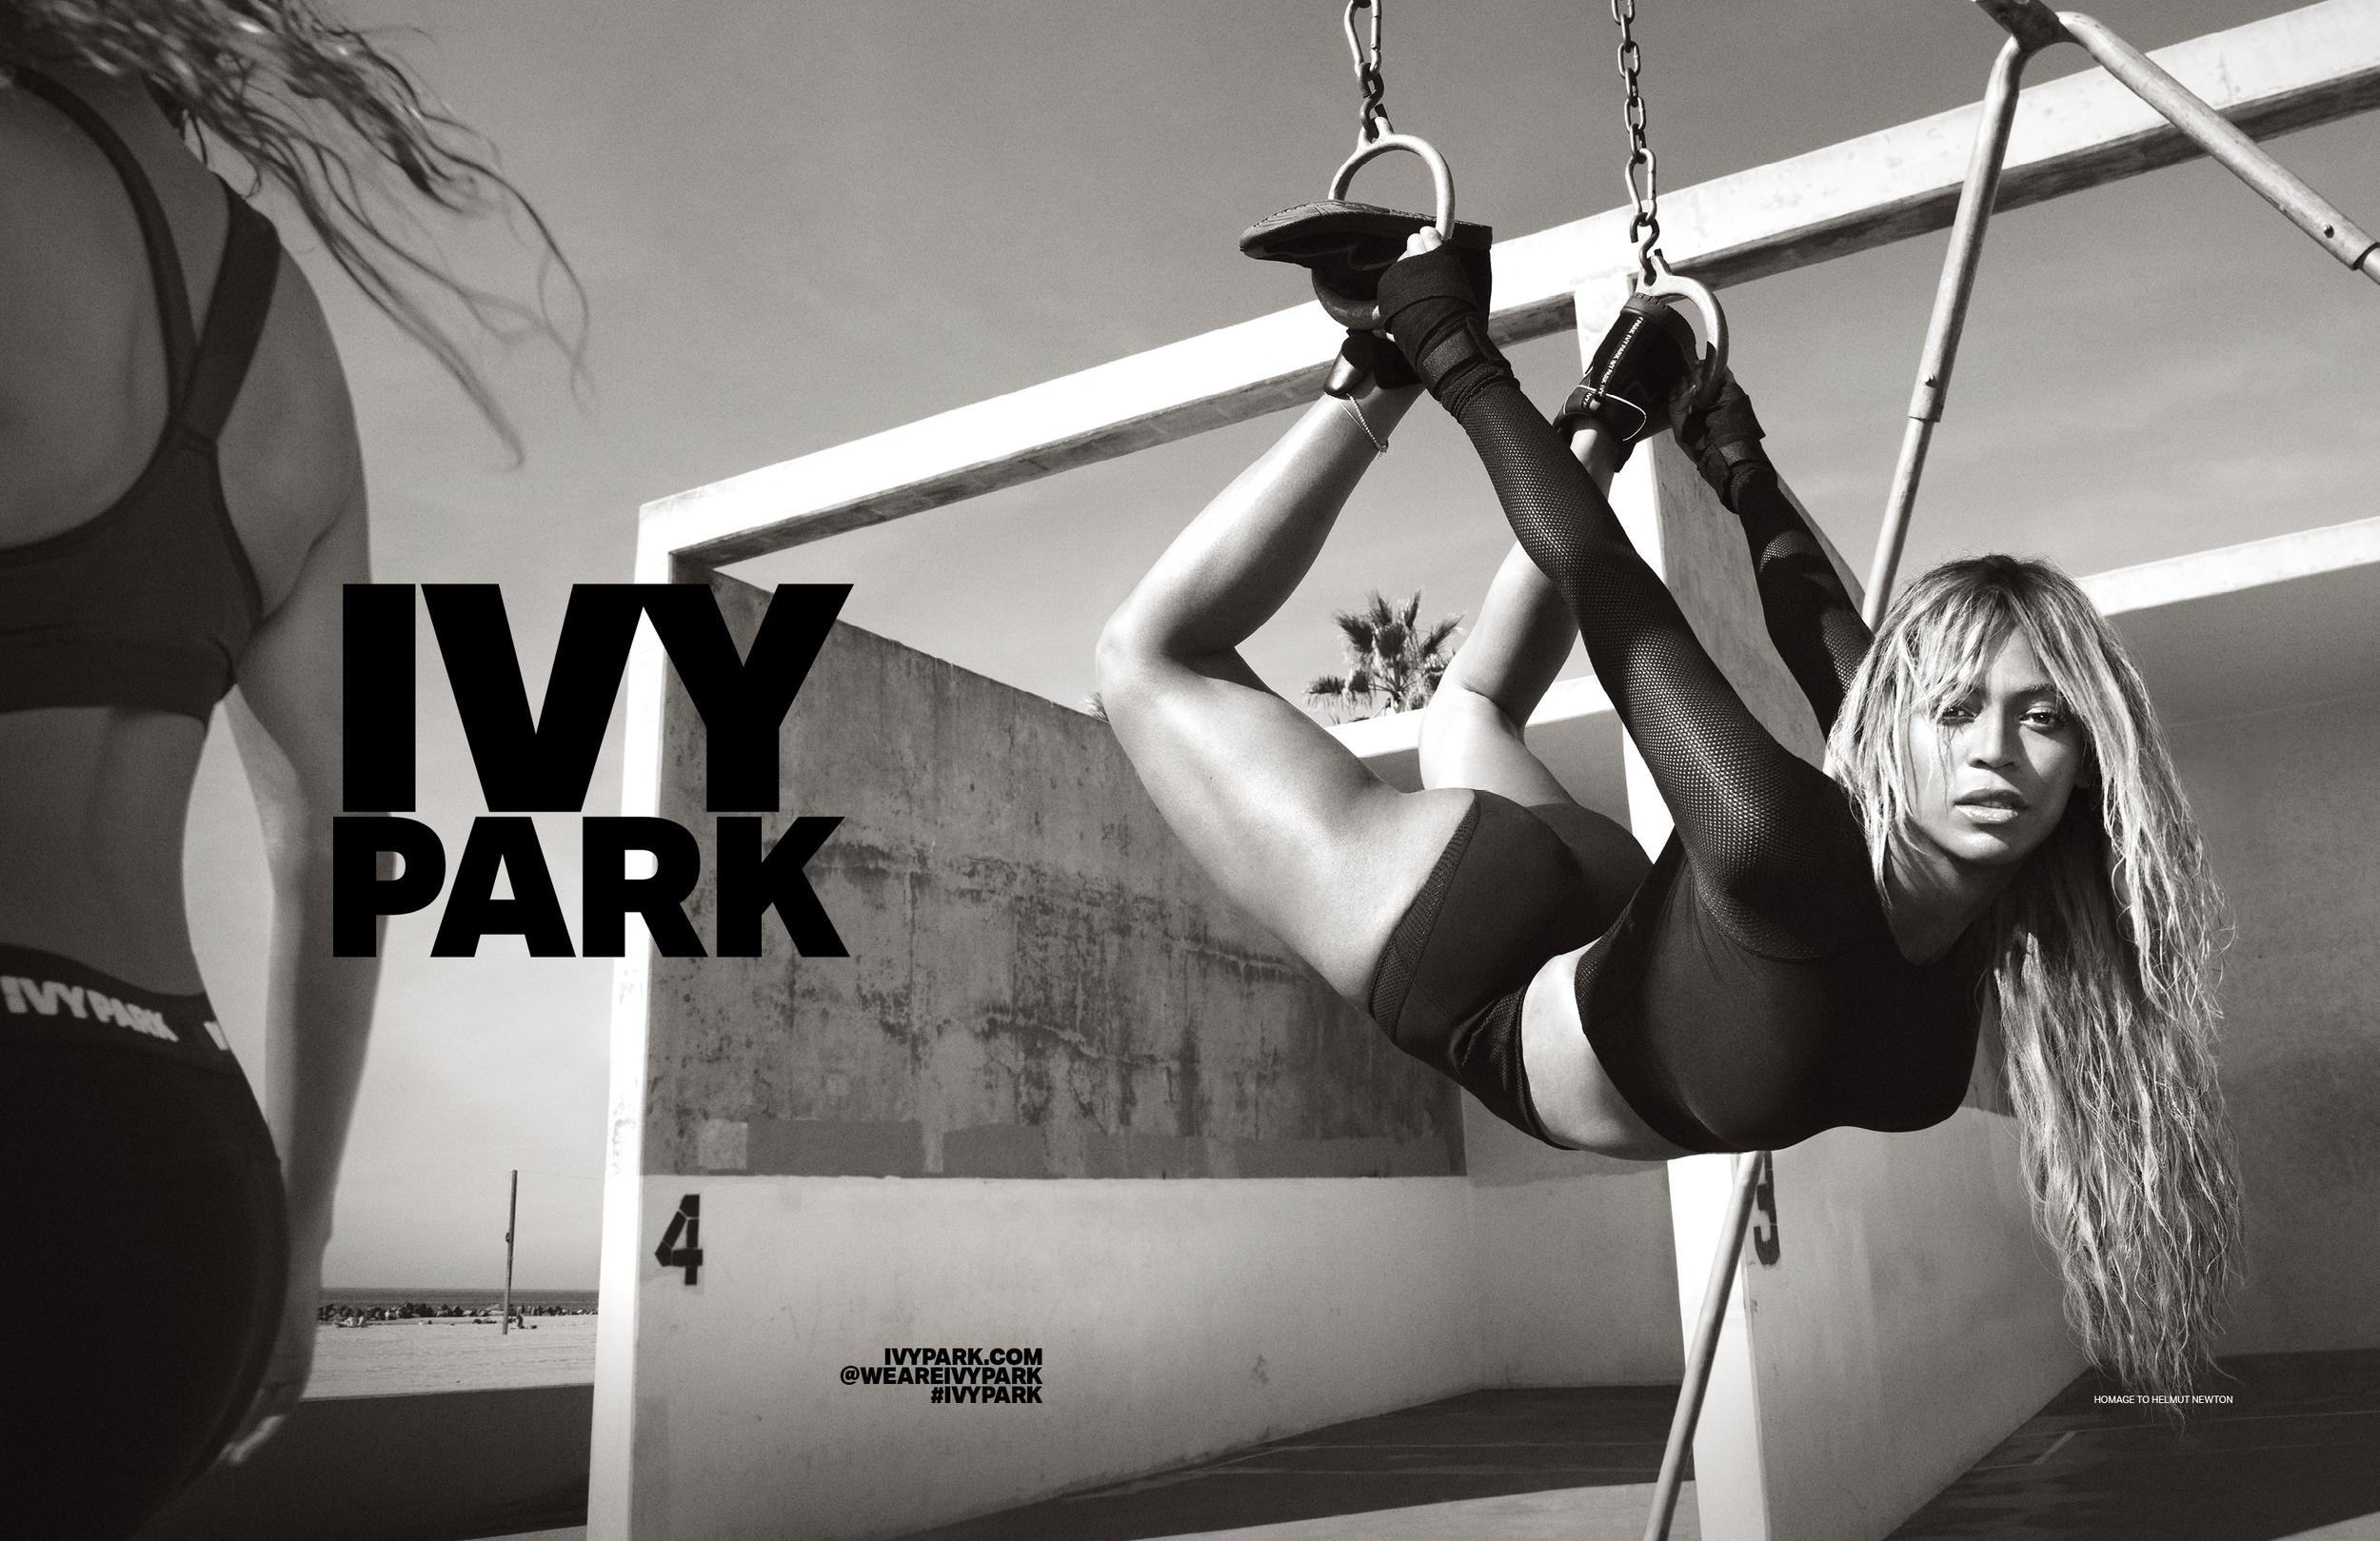 Ivy Park SS16 by Glen Luchford